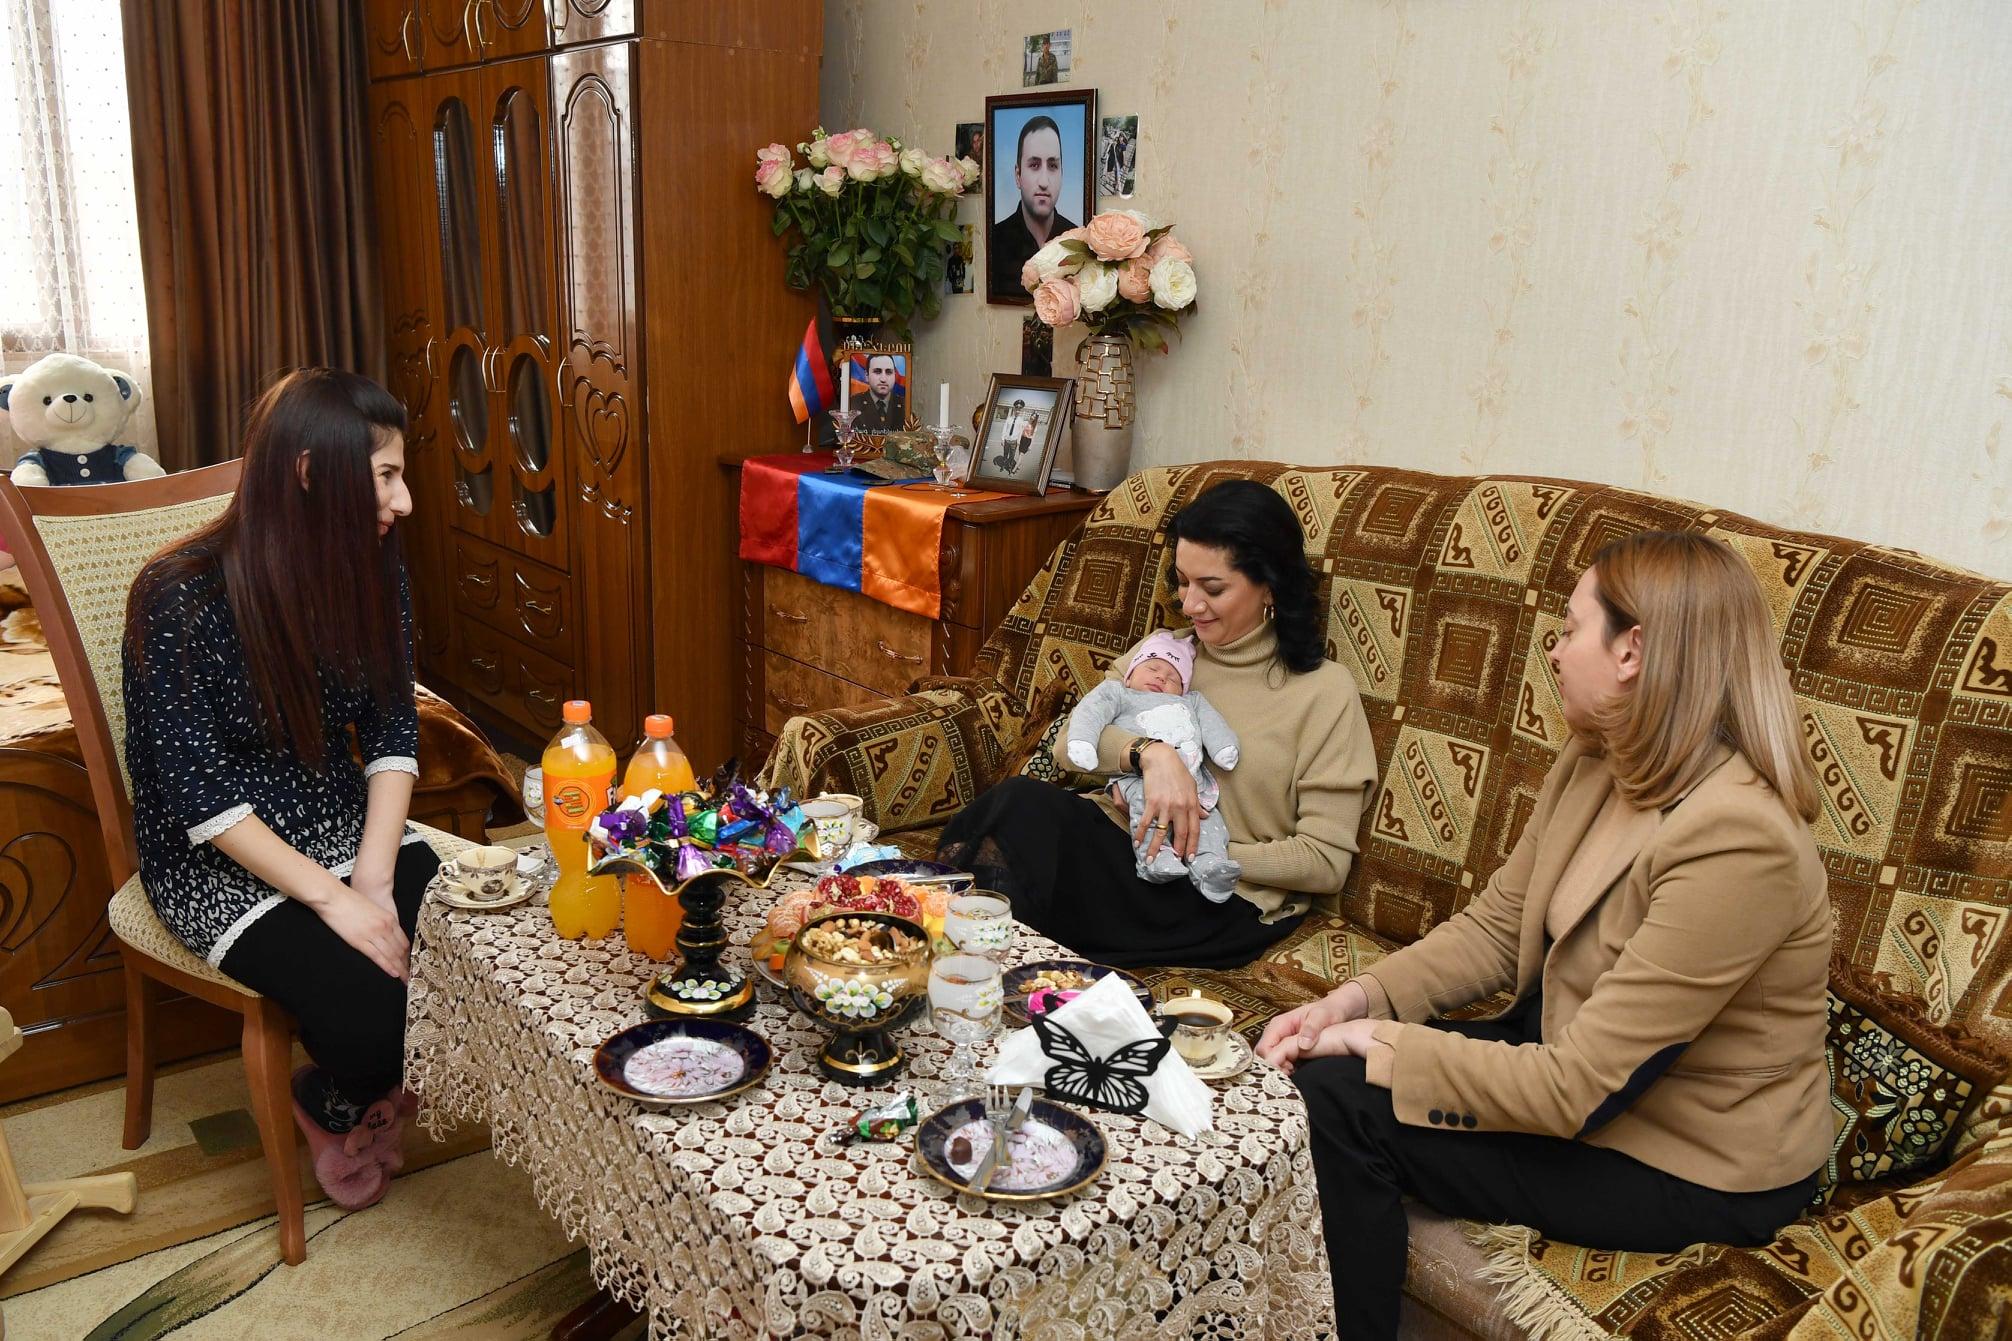 anna hakobyan,lena nazaryan,hayastan,աննա հակոբյան,լենա նազարյան